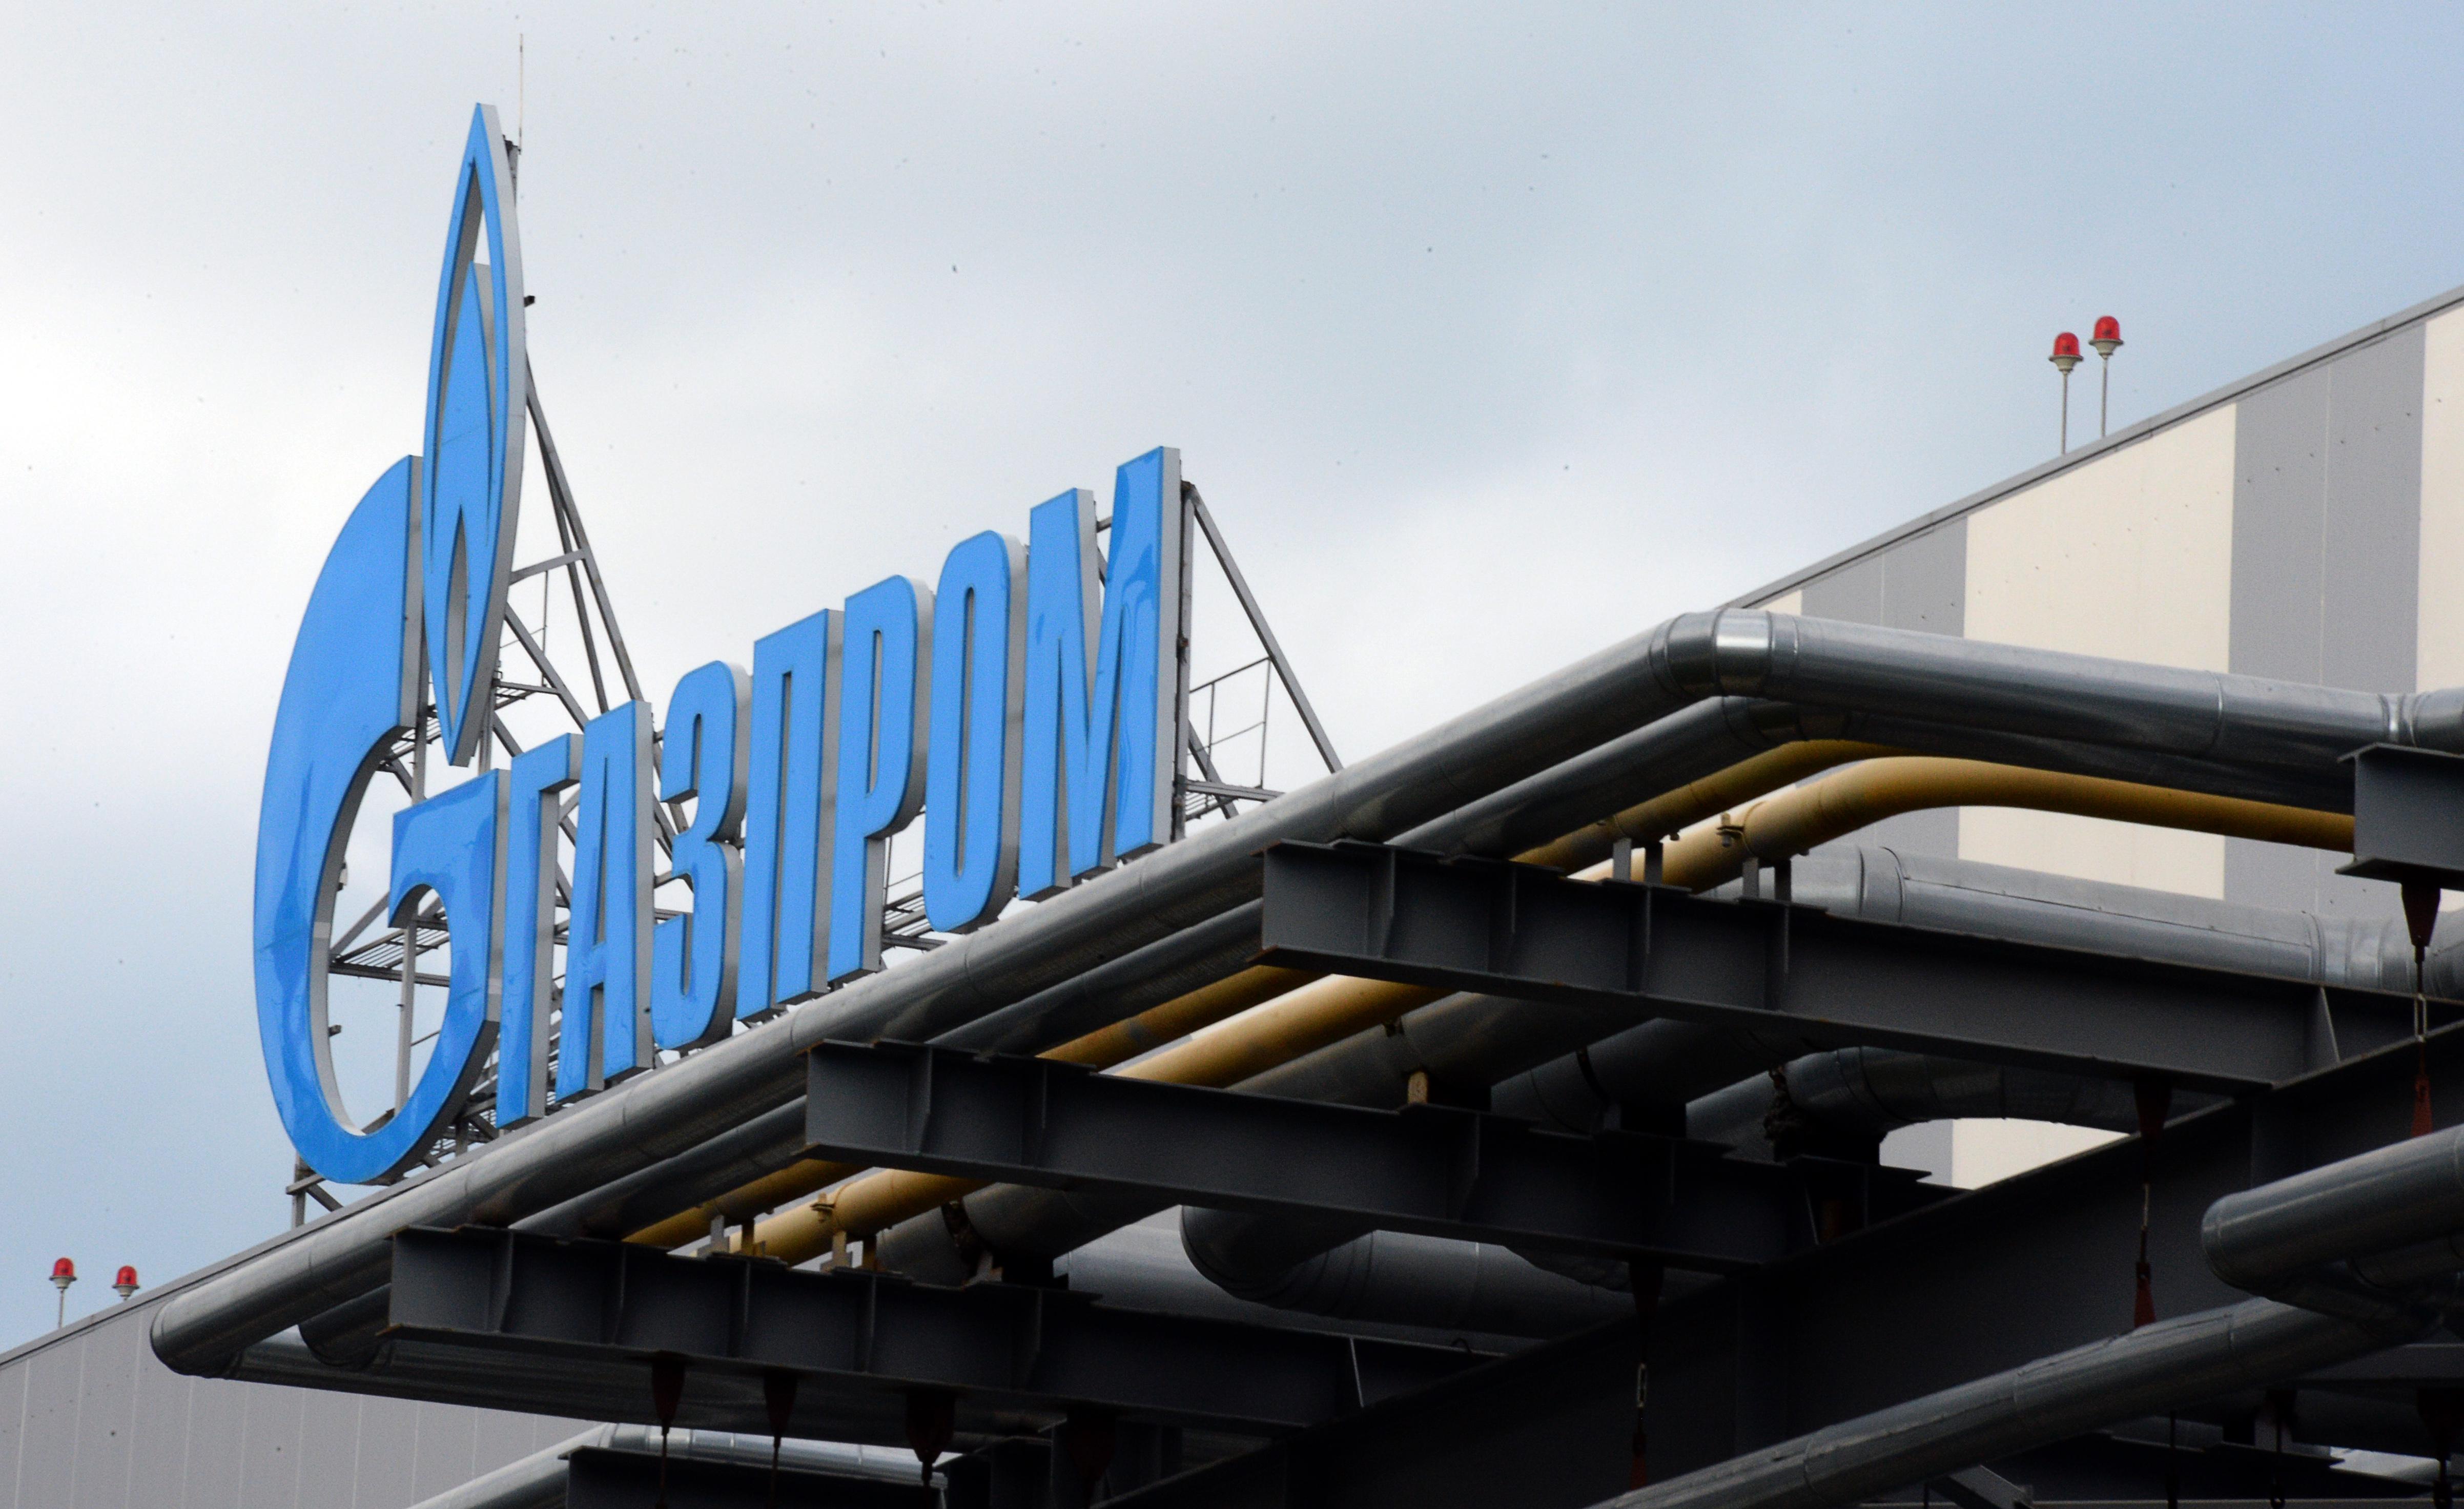 Gazprom's logo. (Yuri Kadobnov/AFP/Getty Images)